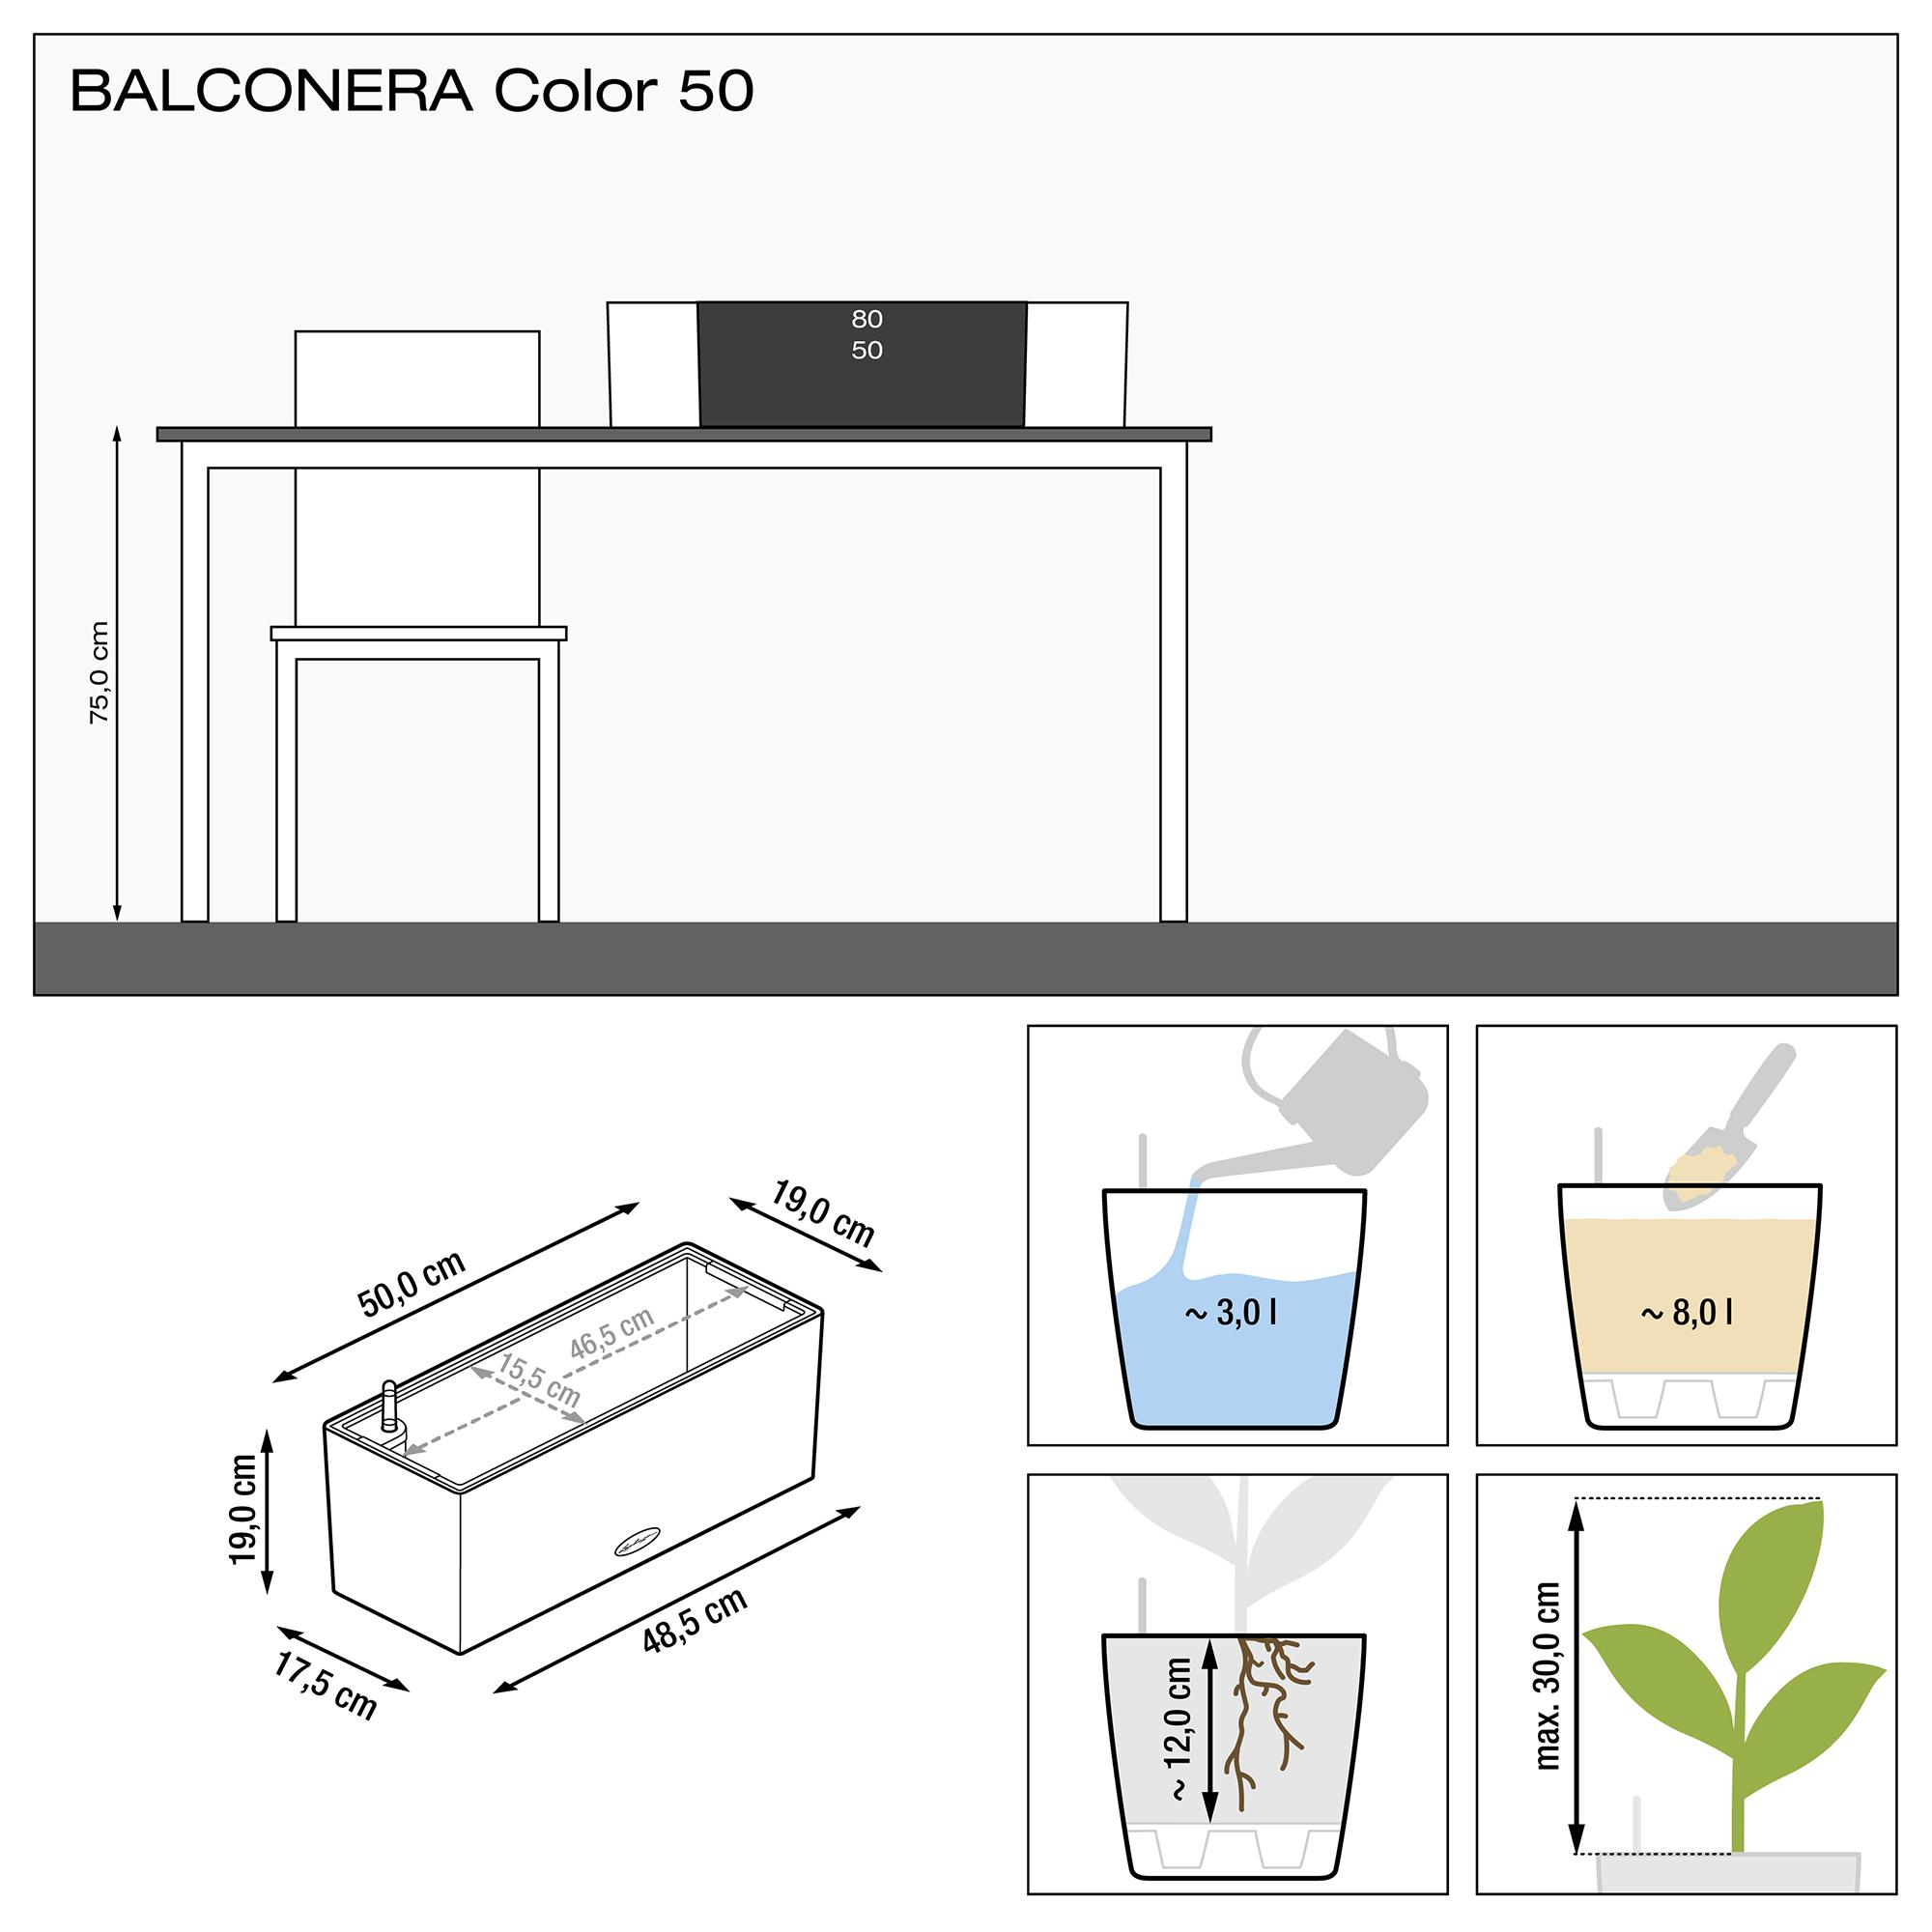 BALCONERA Color 50 muskat - Bild 3